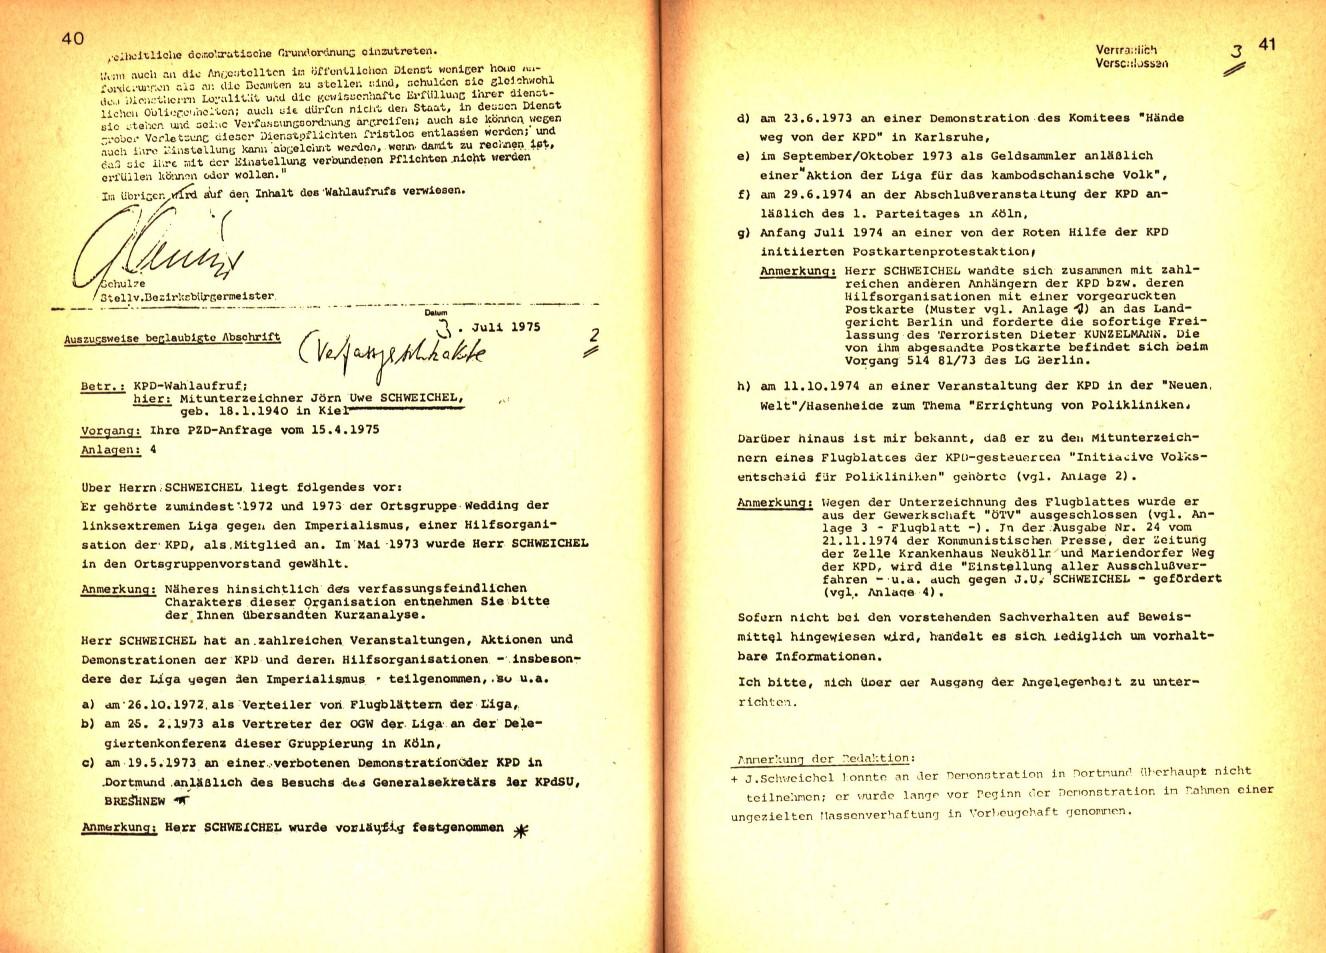 Berlin_VDS_Aktionskomitee_1975_BerufsverboteII_22